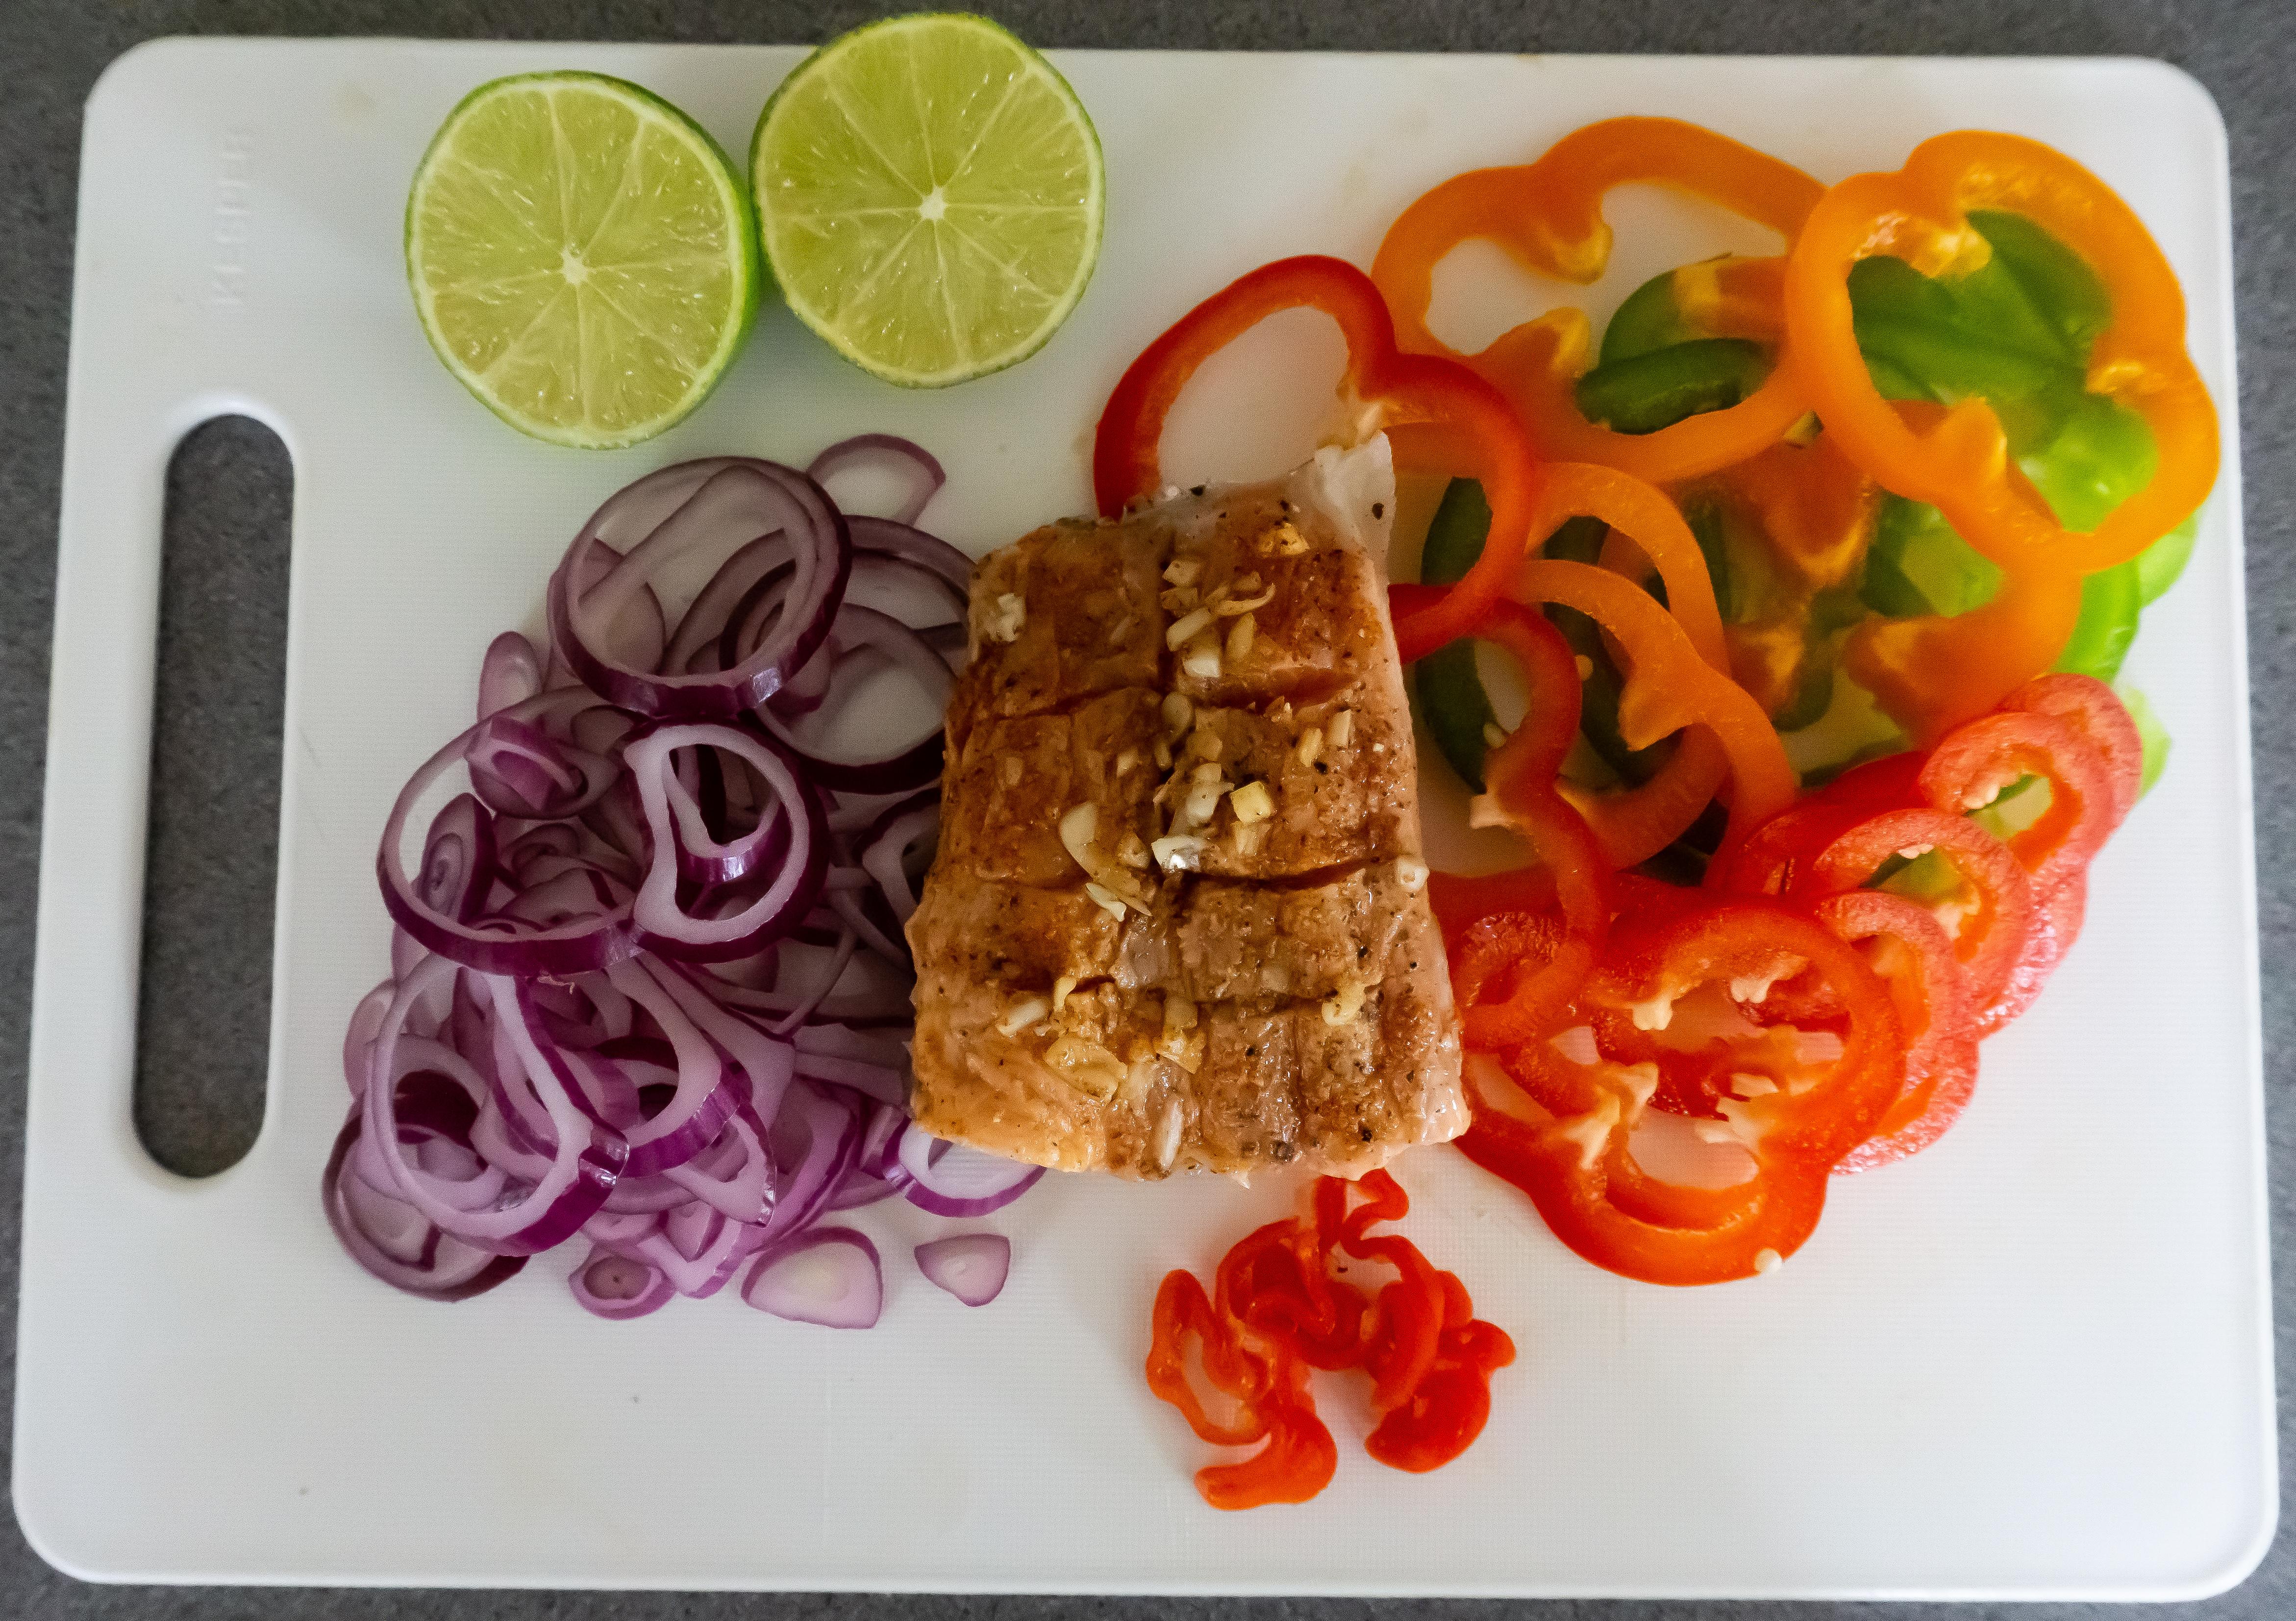 Escovitch Salmon Seasoning